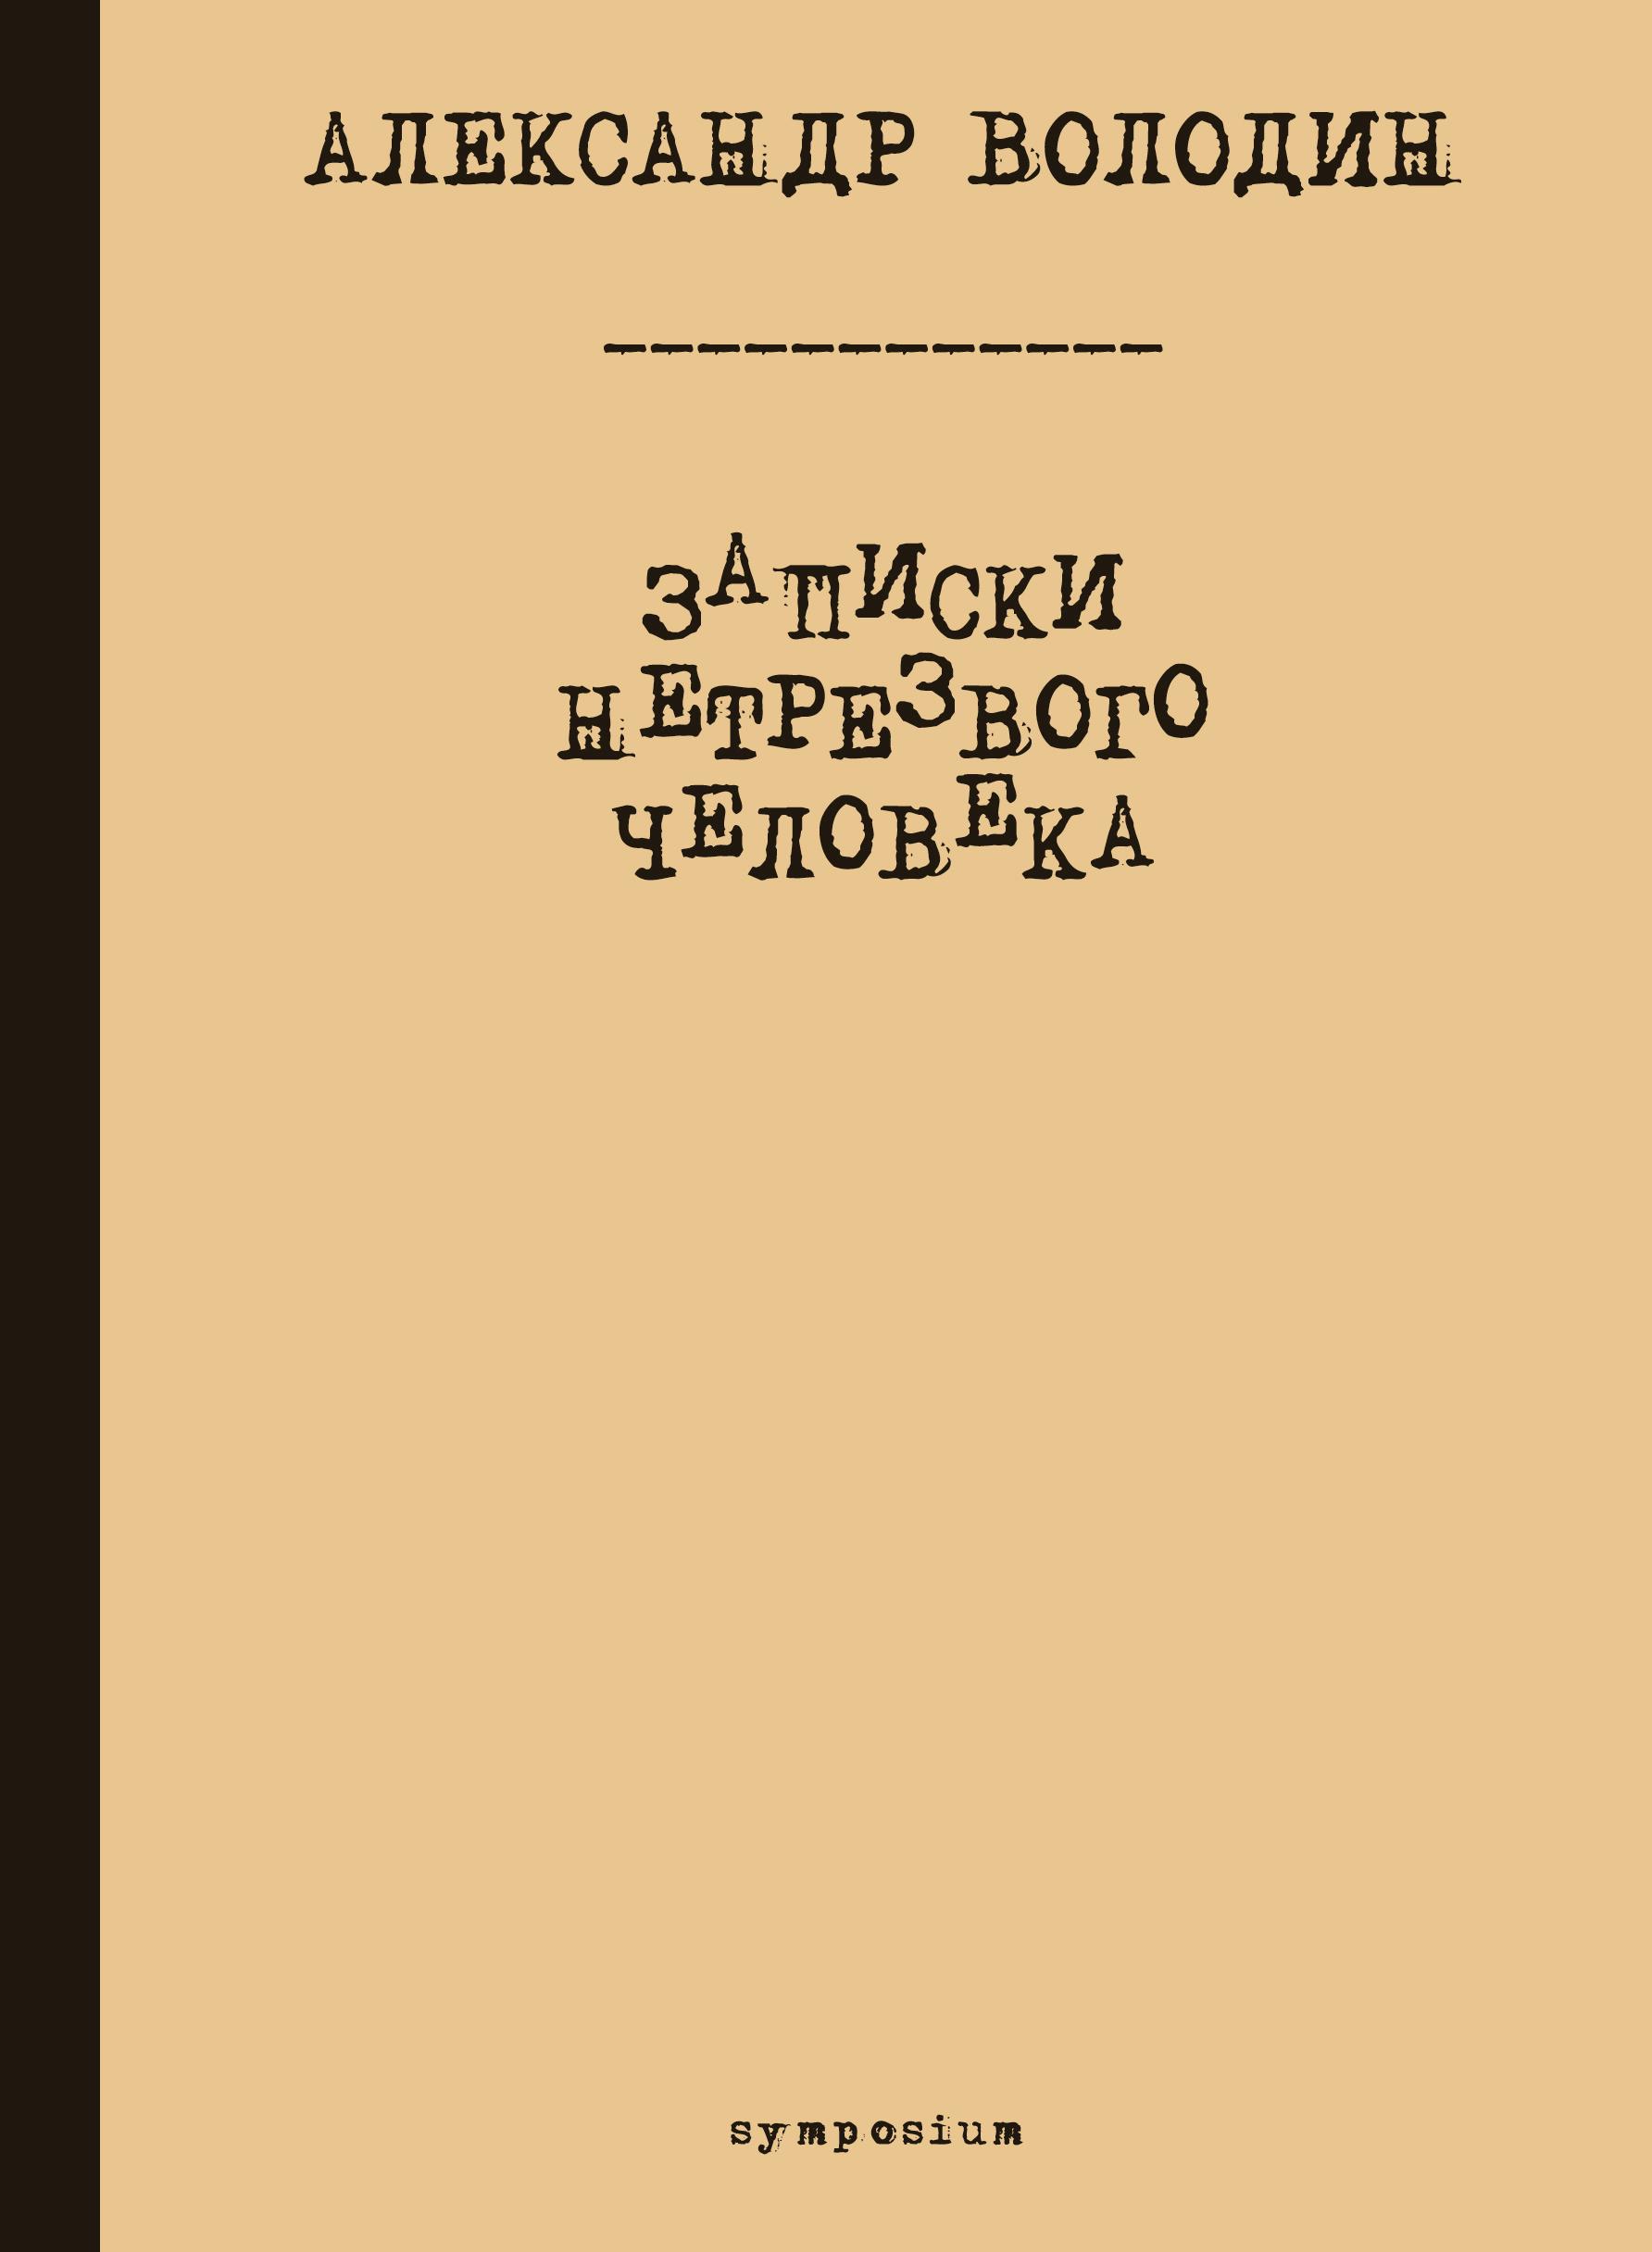 Купить книгу Записки нетрезвого человека, автора Александра Володина